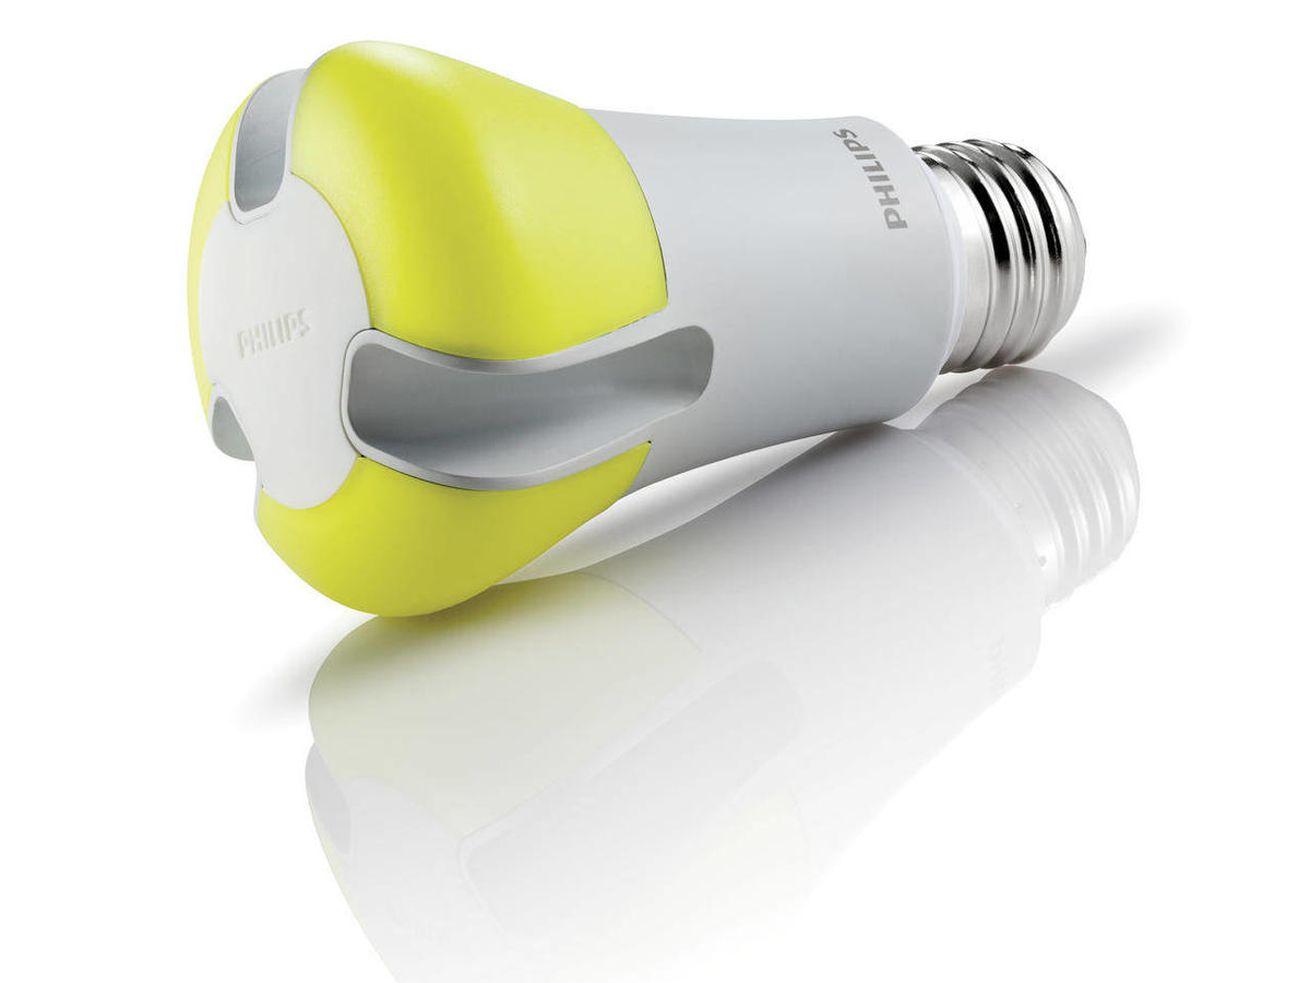 WSU helps sponsor free community lightbulb exchange